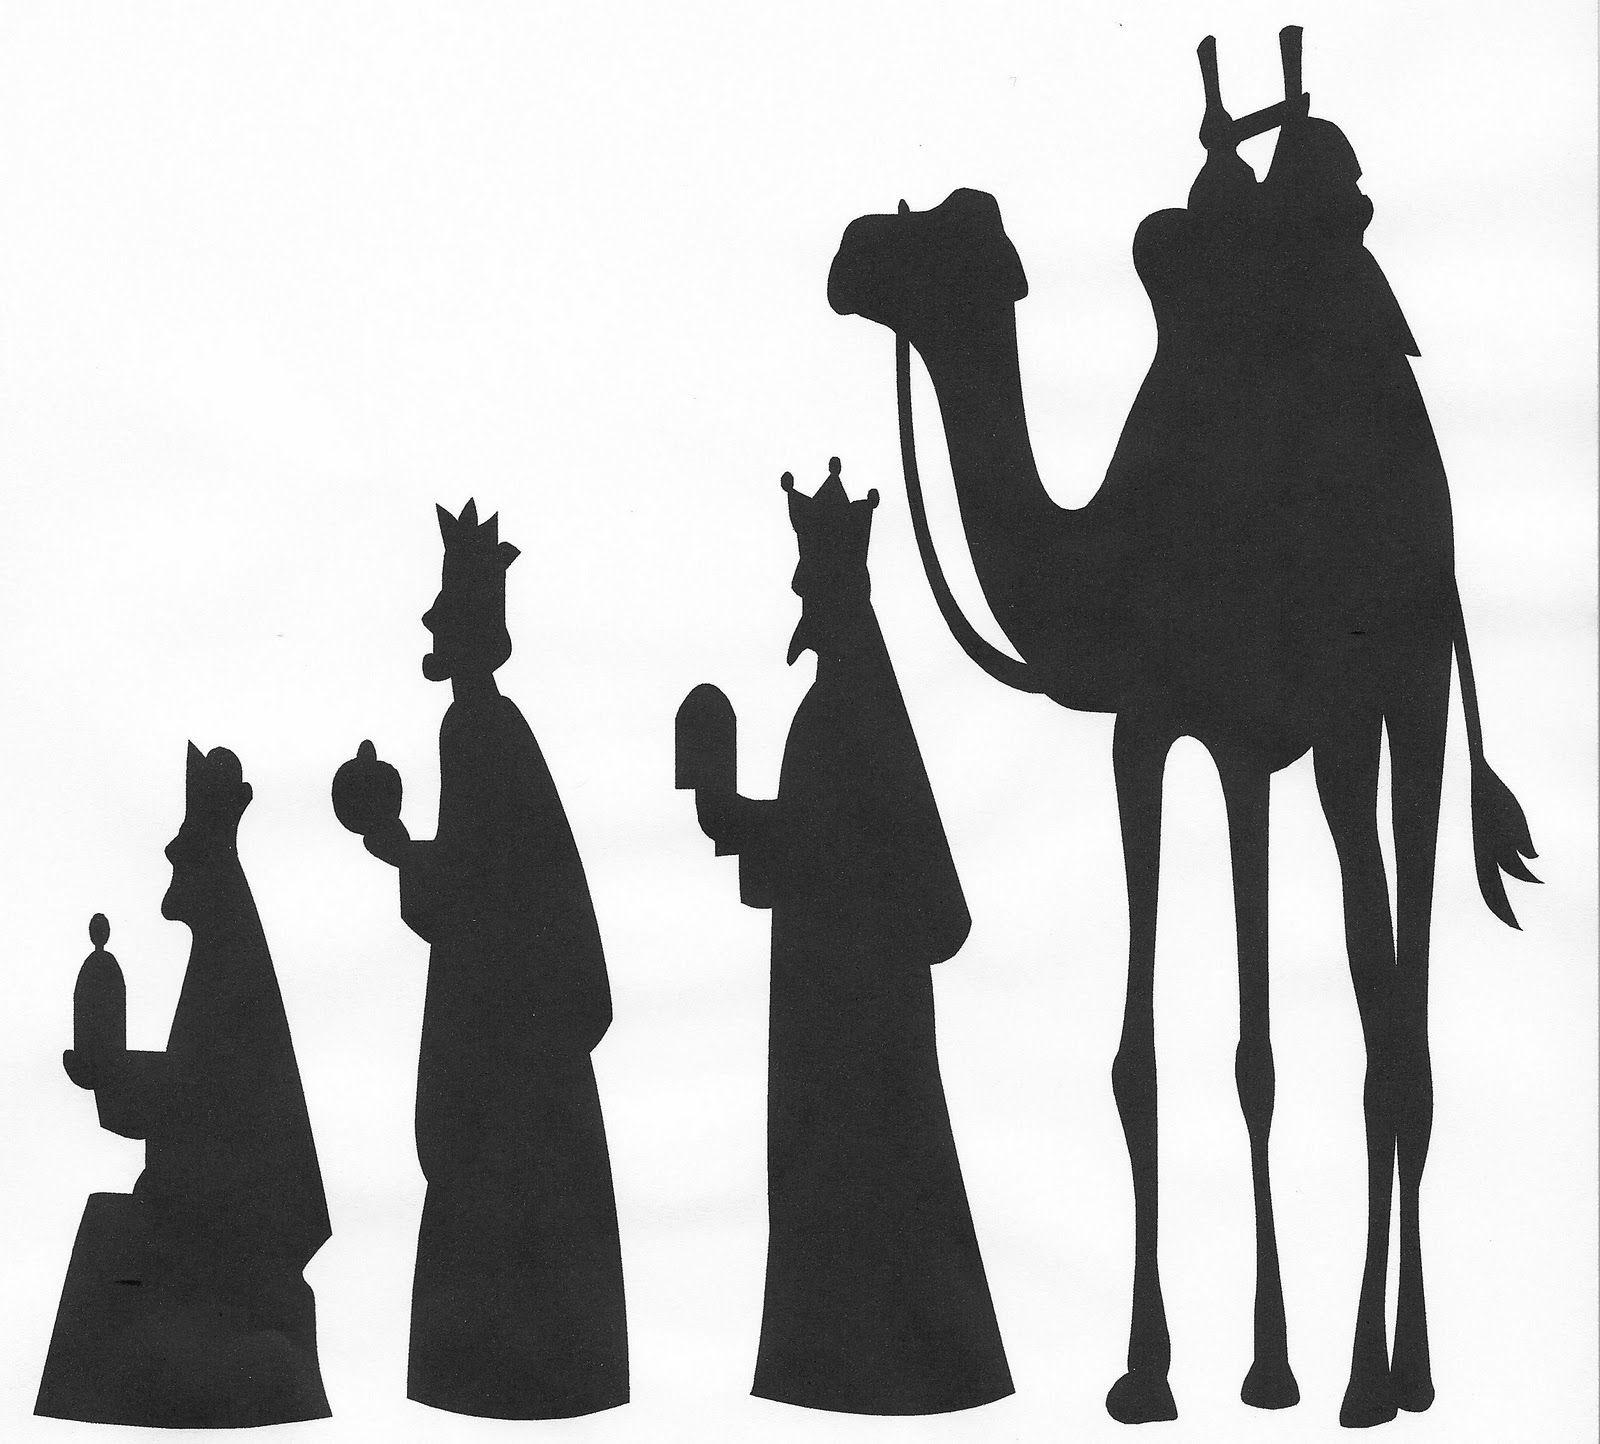 medium resolution of wise men silhouette clip art google search